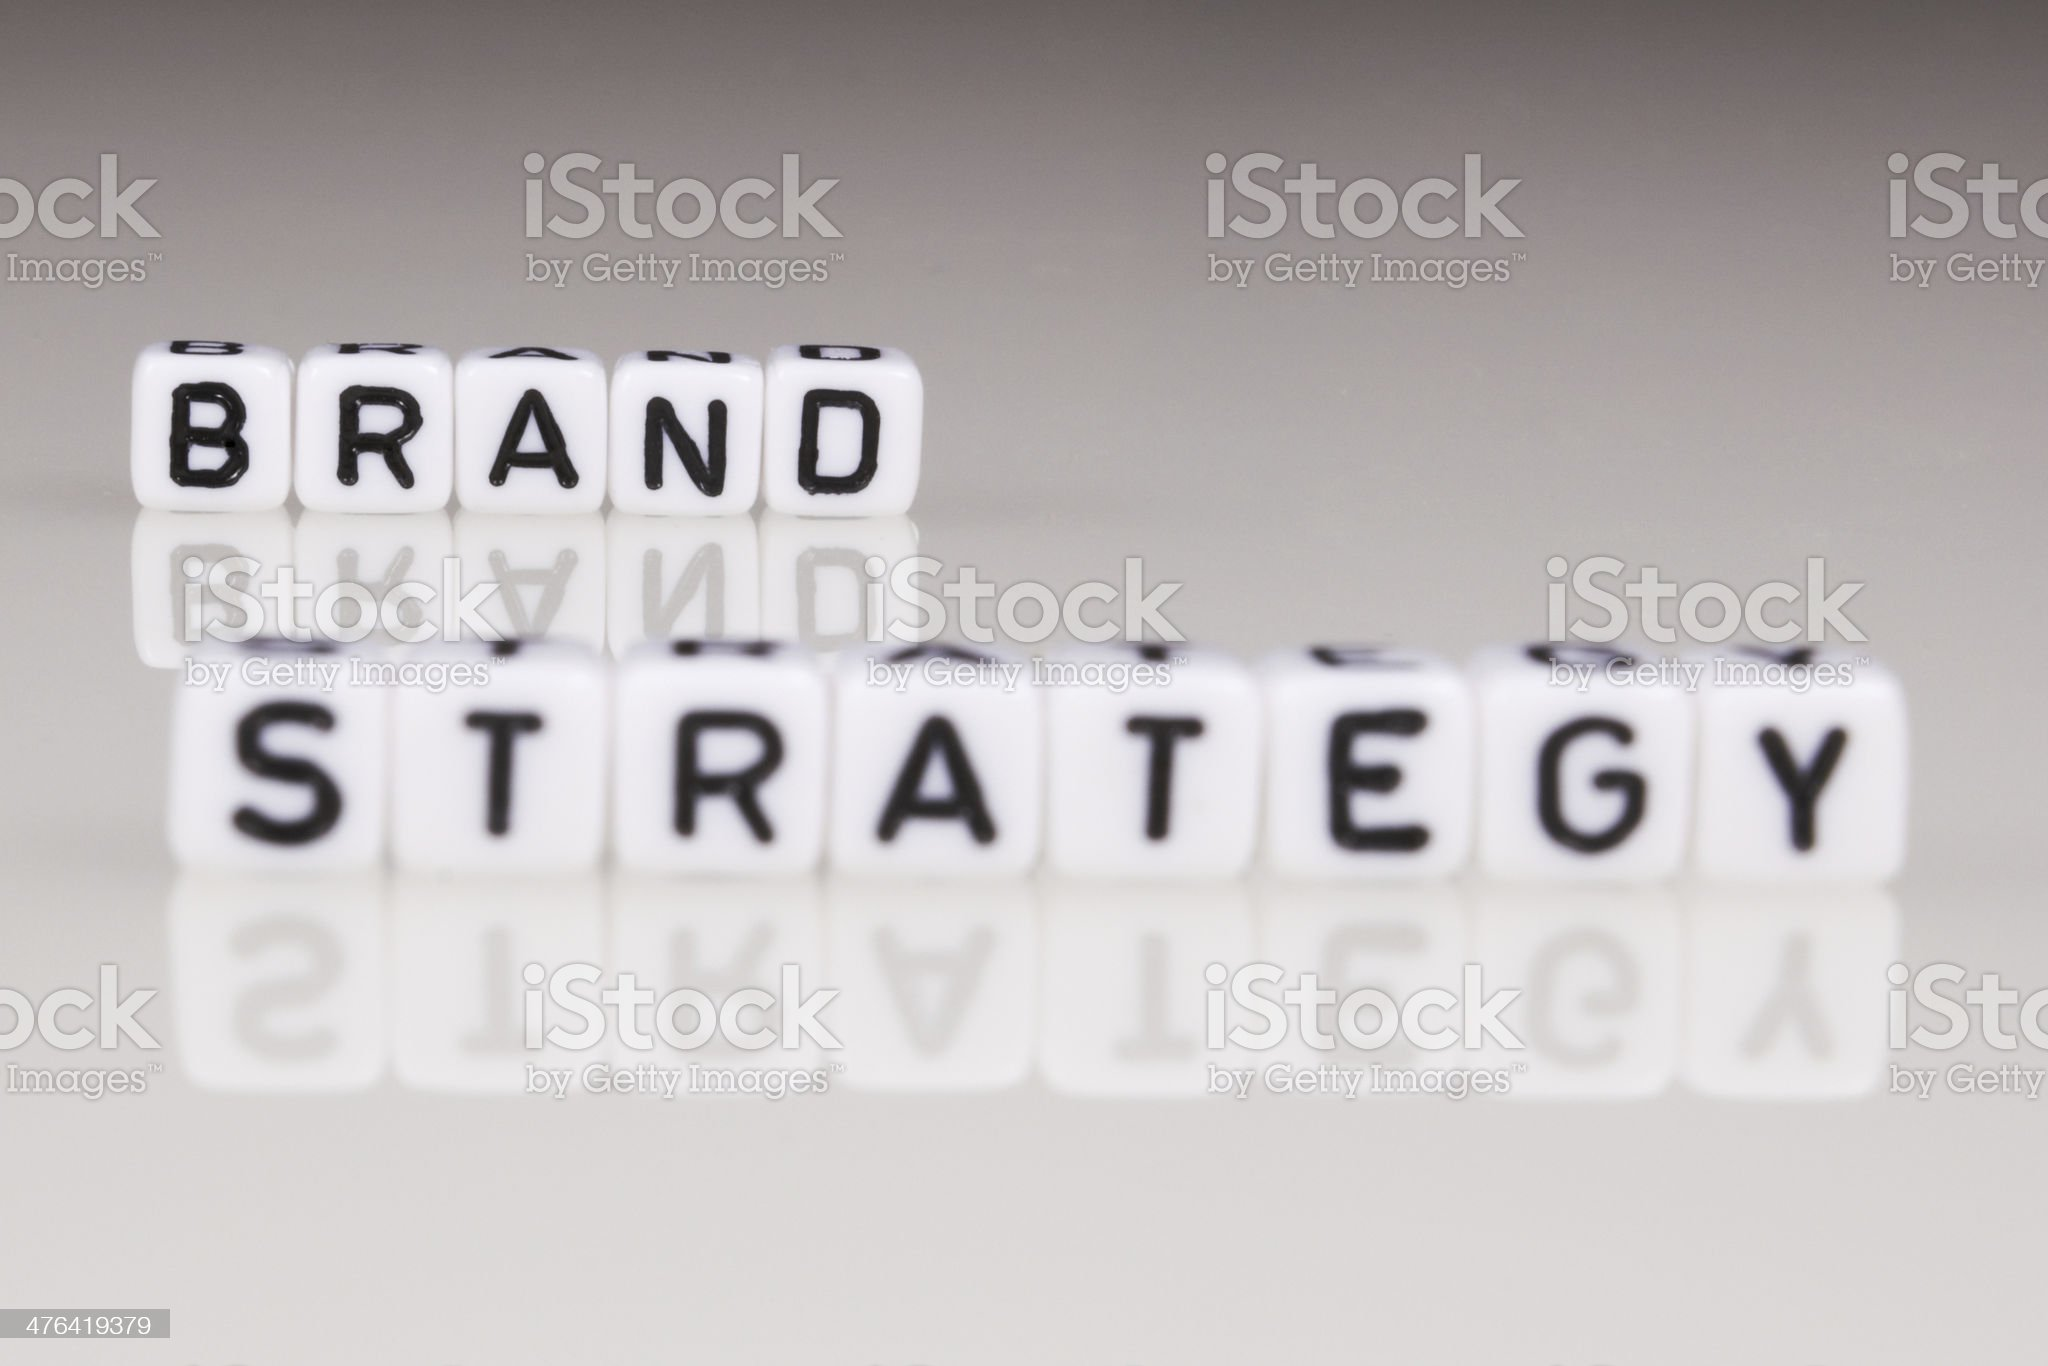 Brand Strategy royalty-free stock photo